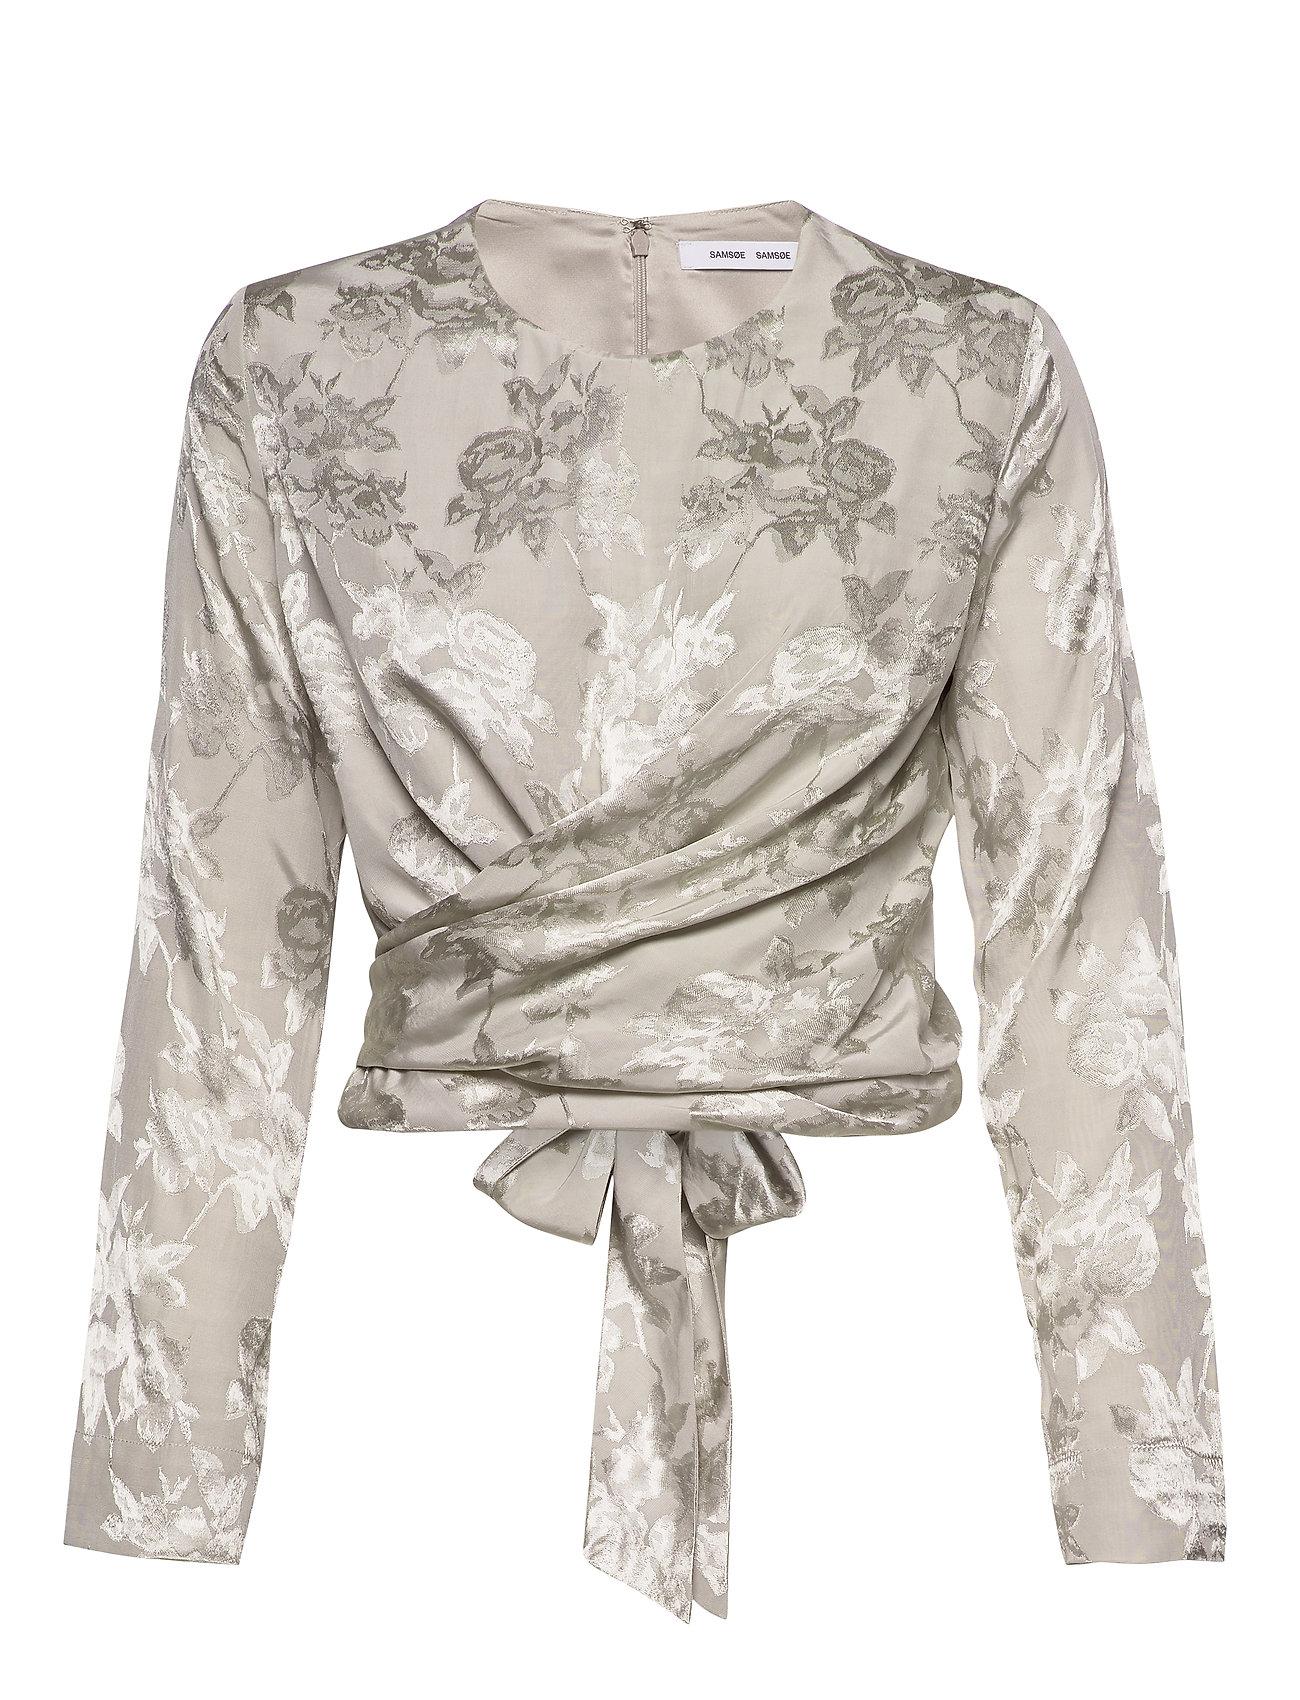 Samsøe & Samsøe Ono blouse 11333 - SILVER CLOUD